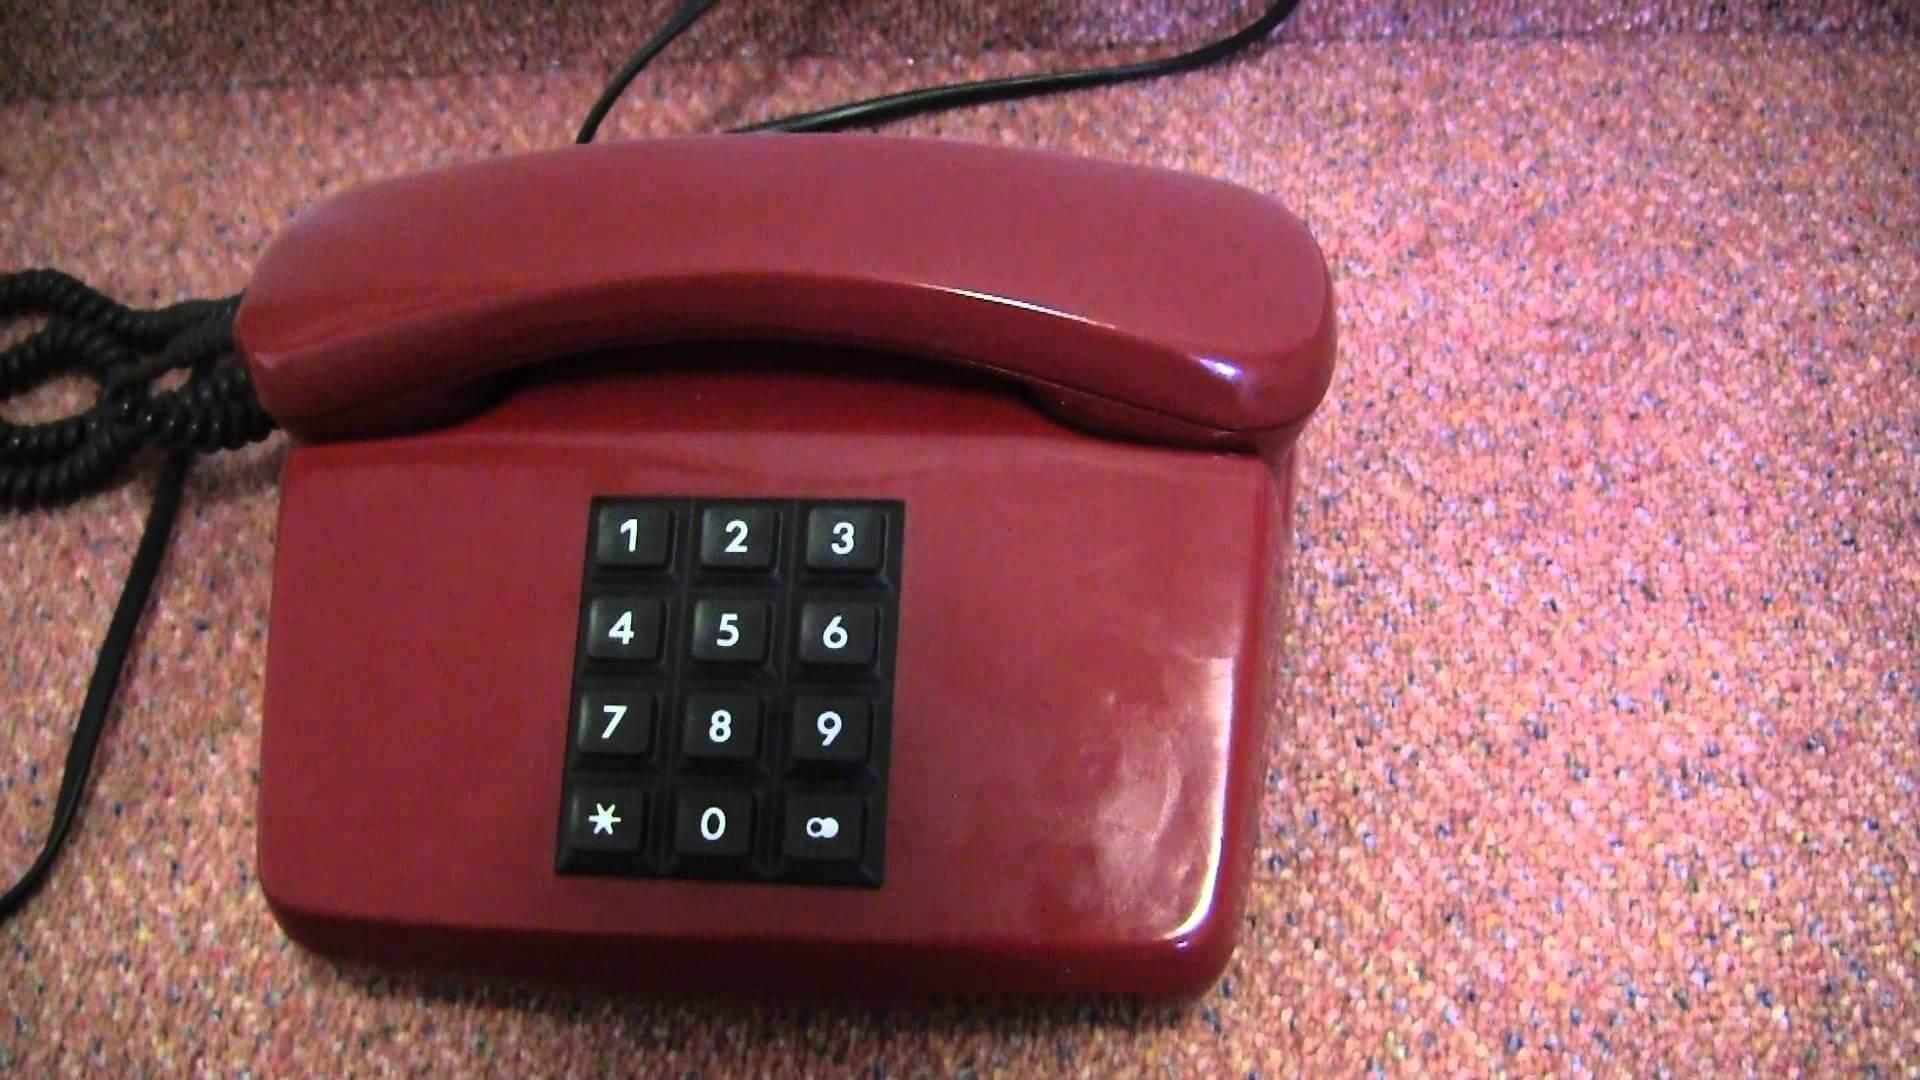 Lanline Phone